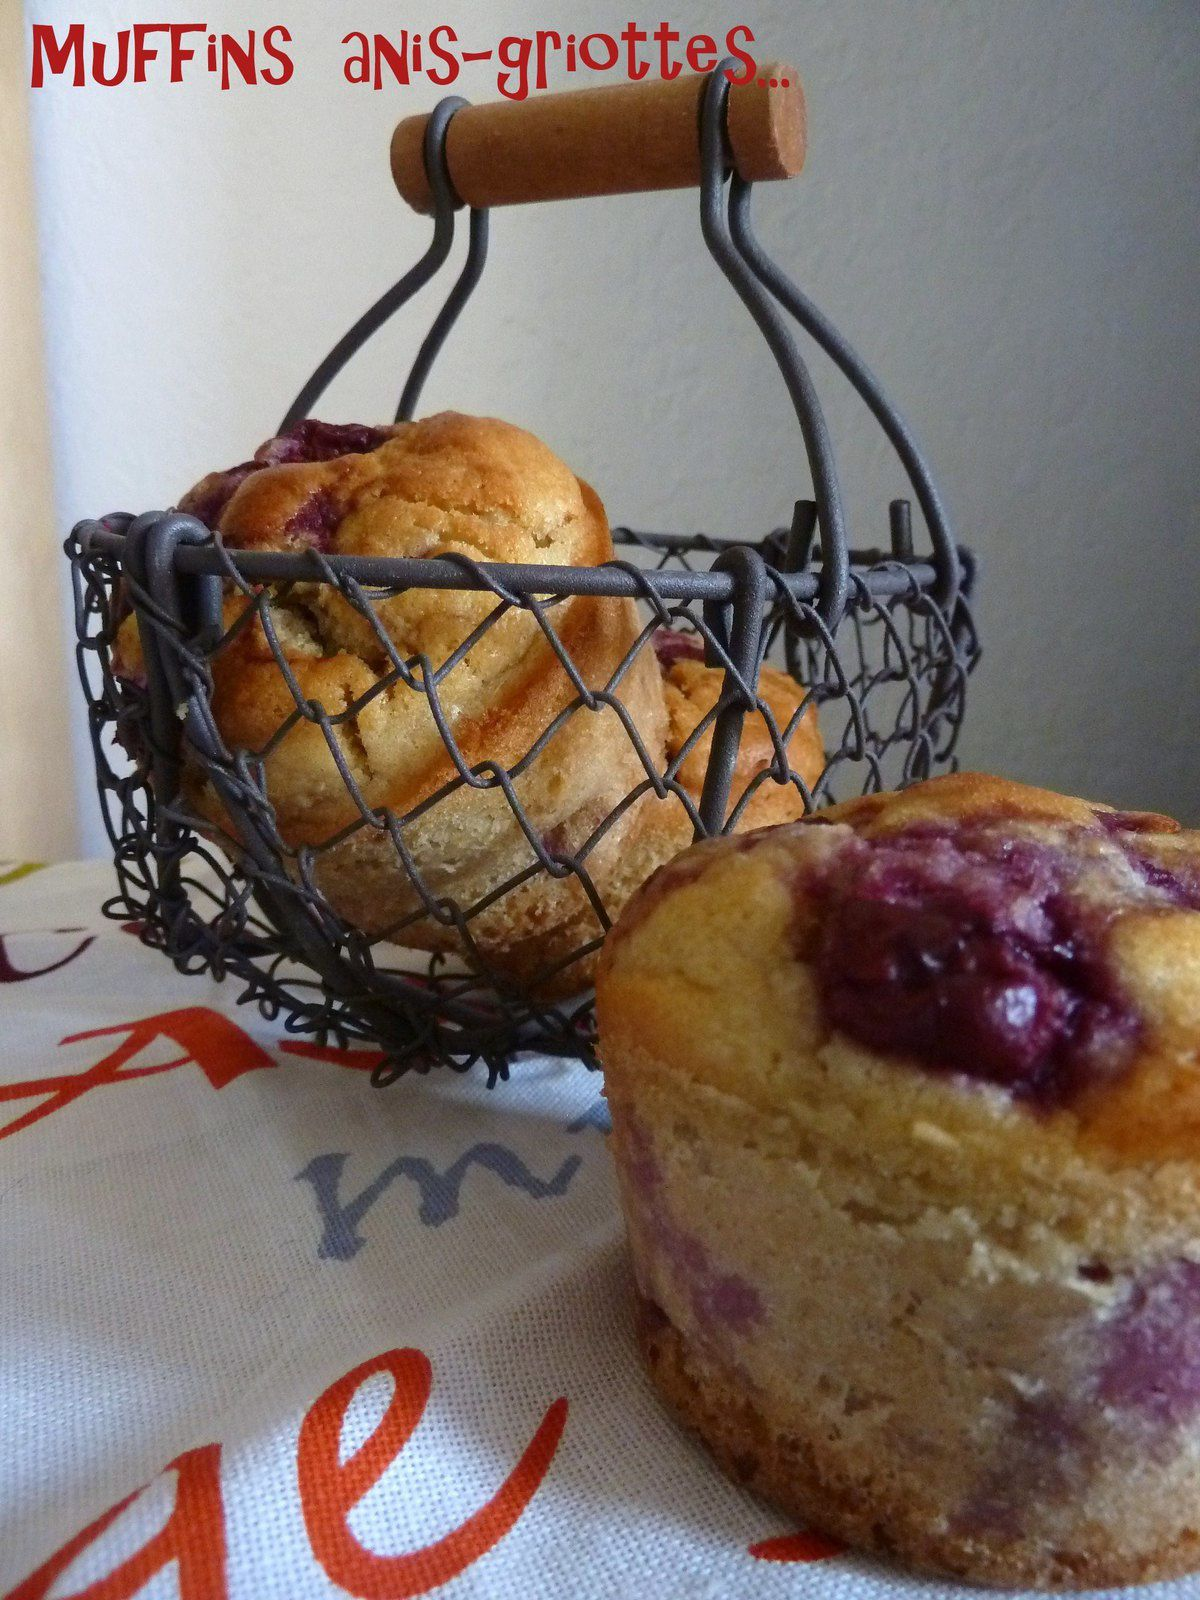 Muffins cerise-anis